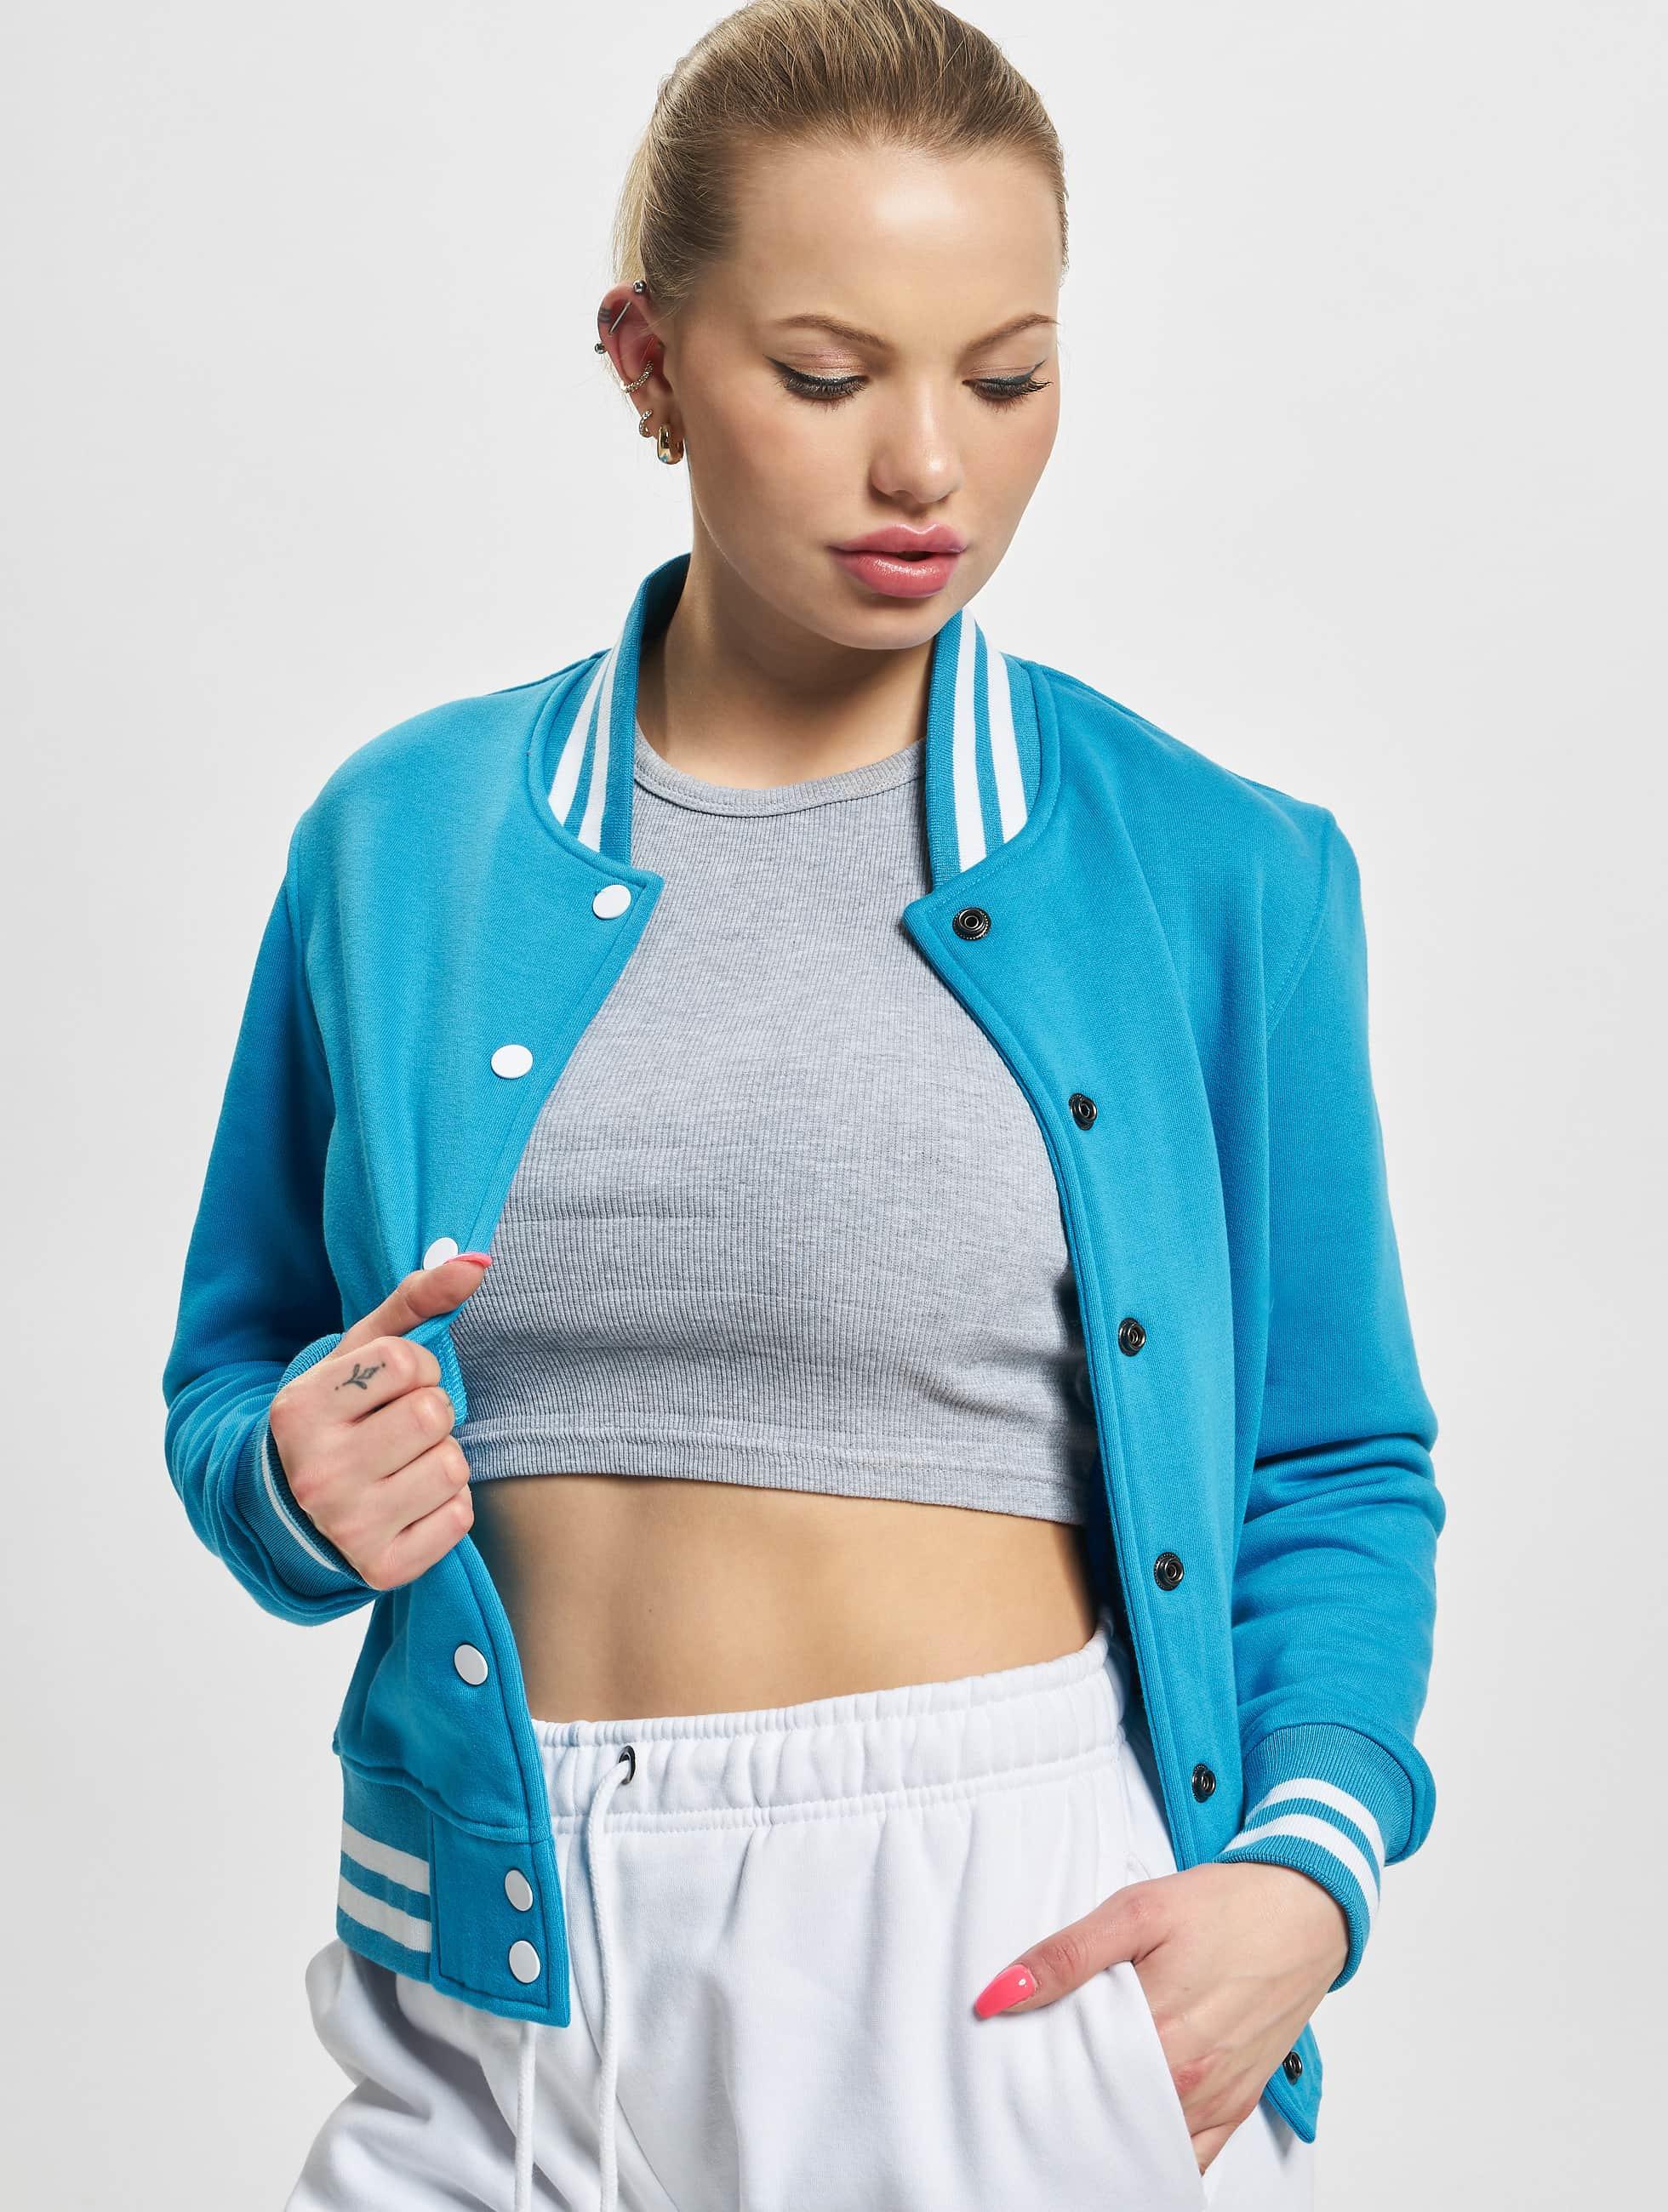 Urban Classics Frauen College Jacke Ladies in türkis